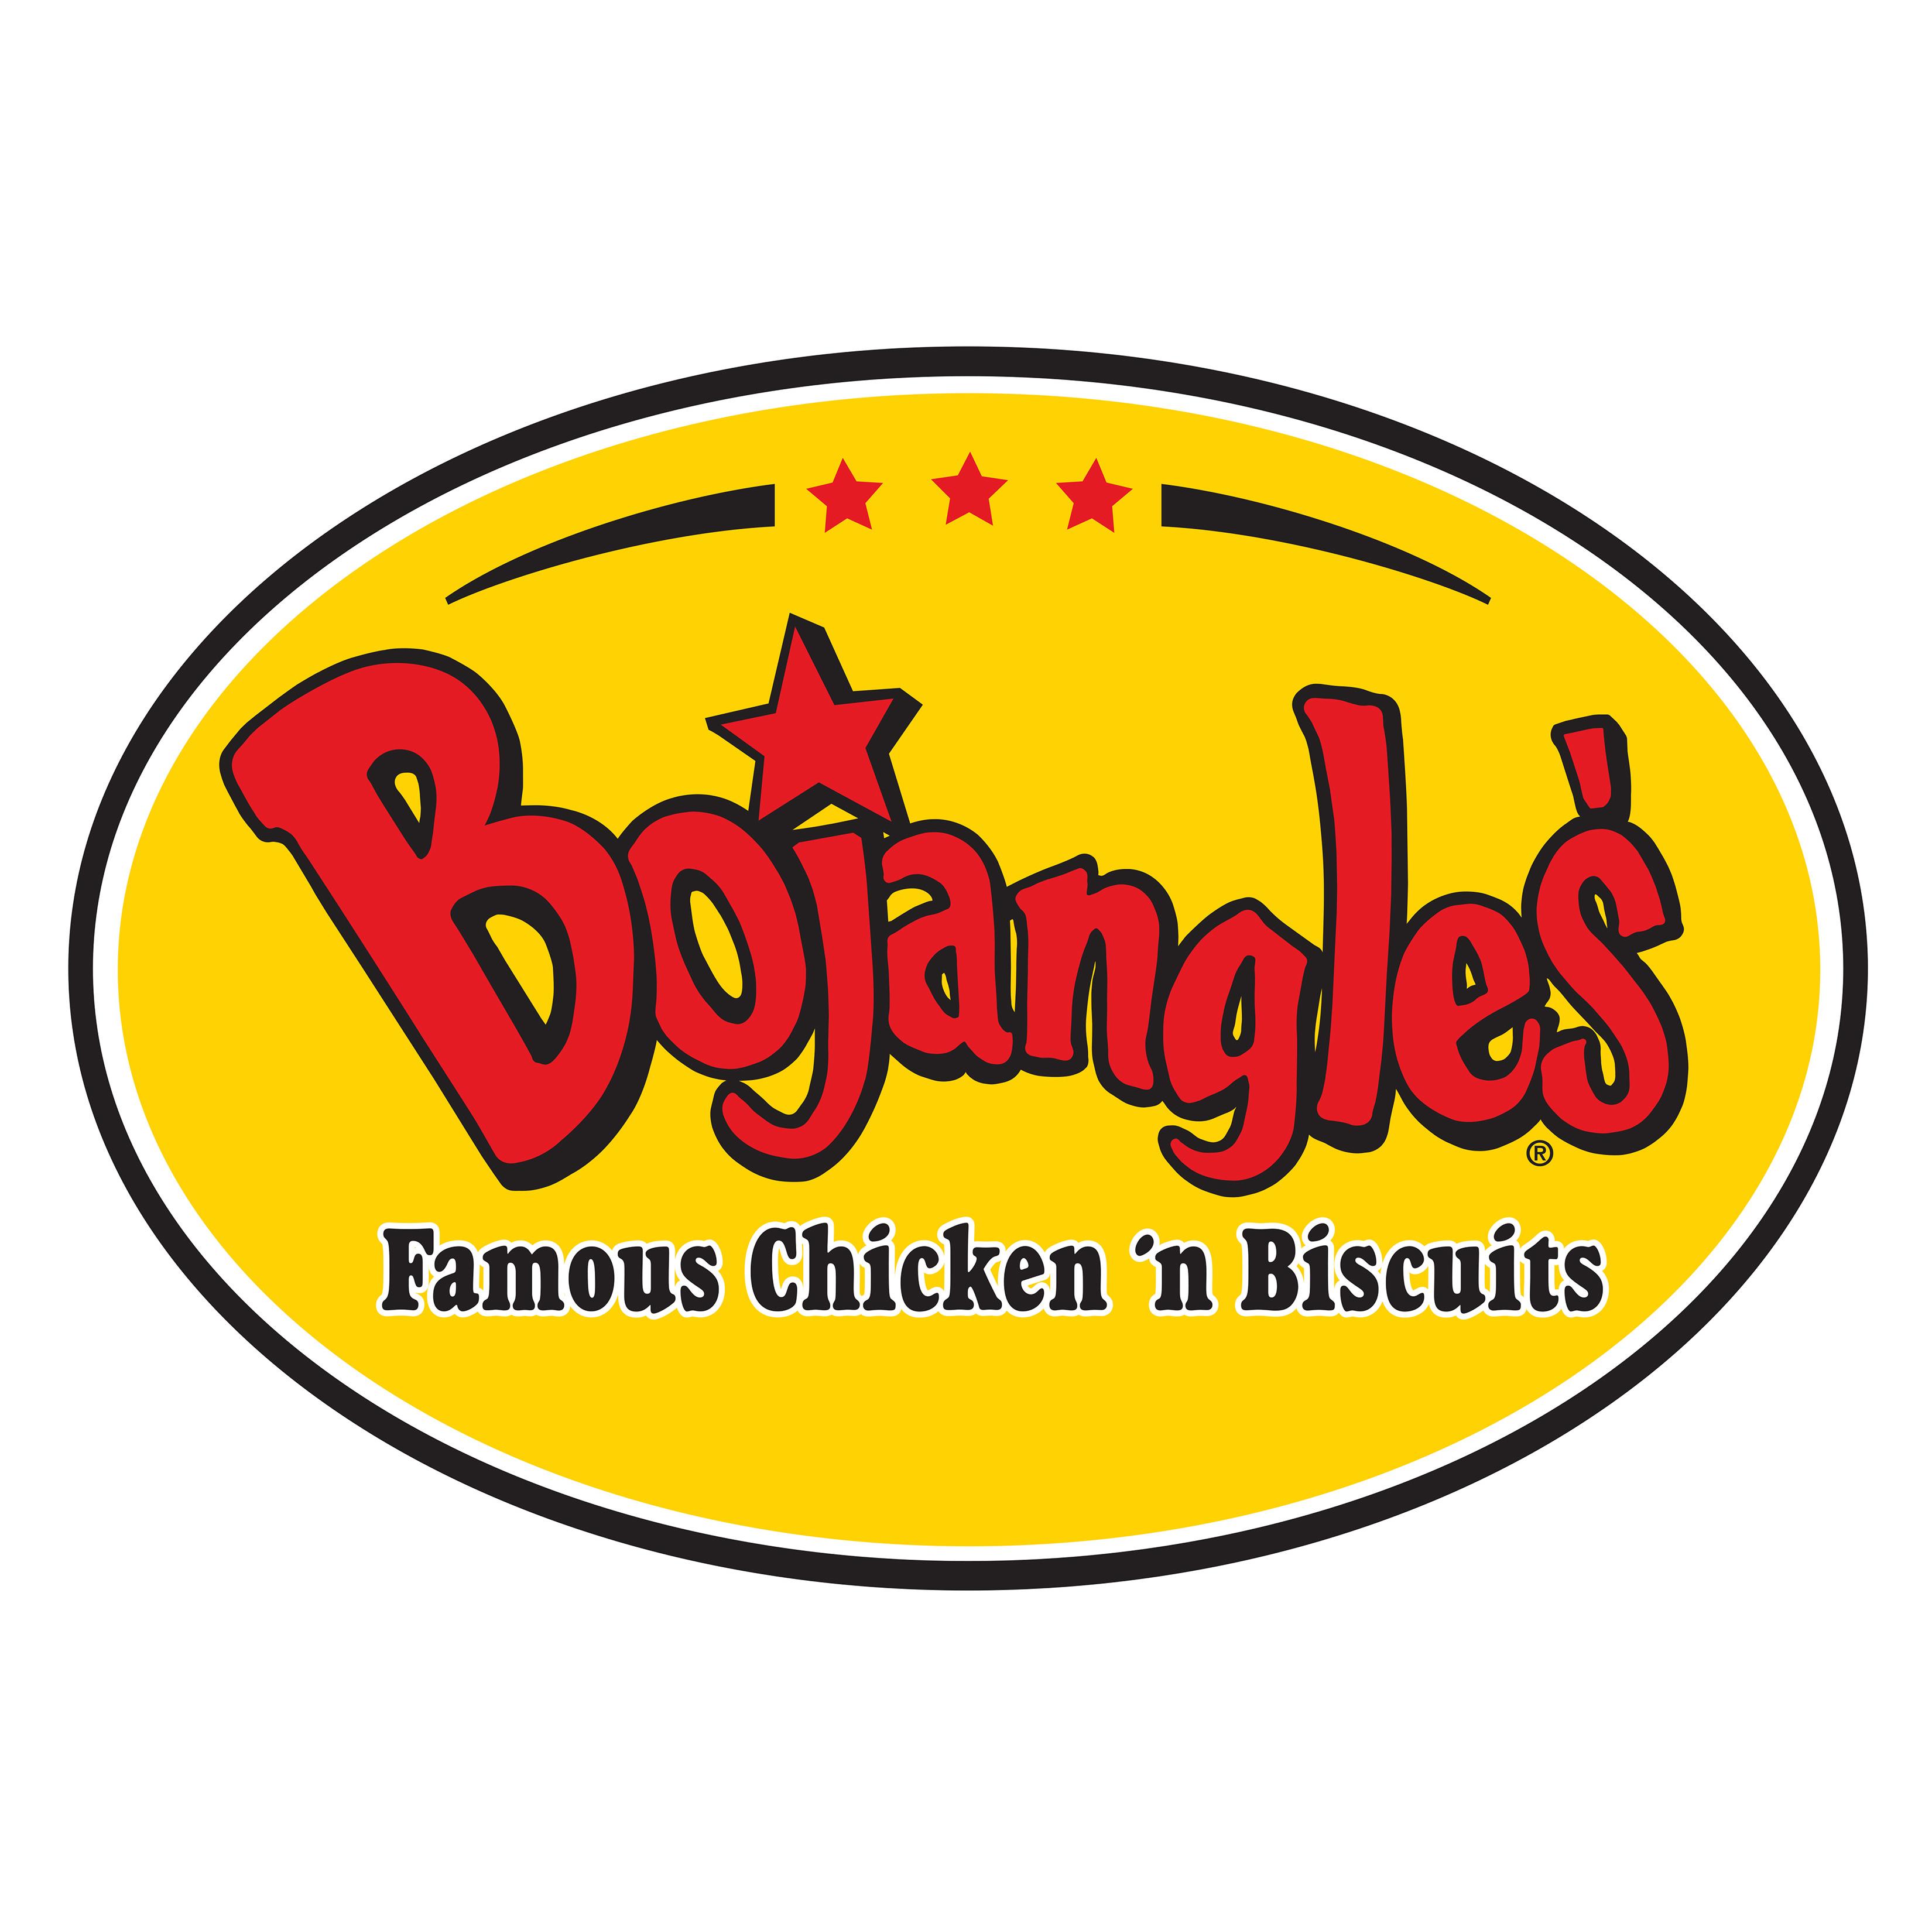 Bojangles At 1626 East 10th Street In Roanoke Rapids Nc